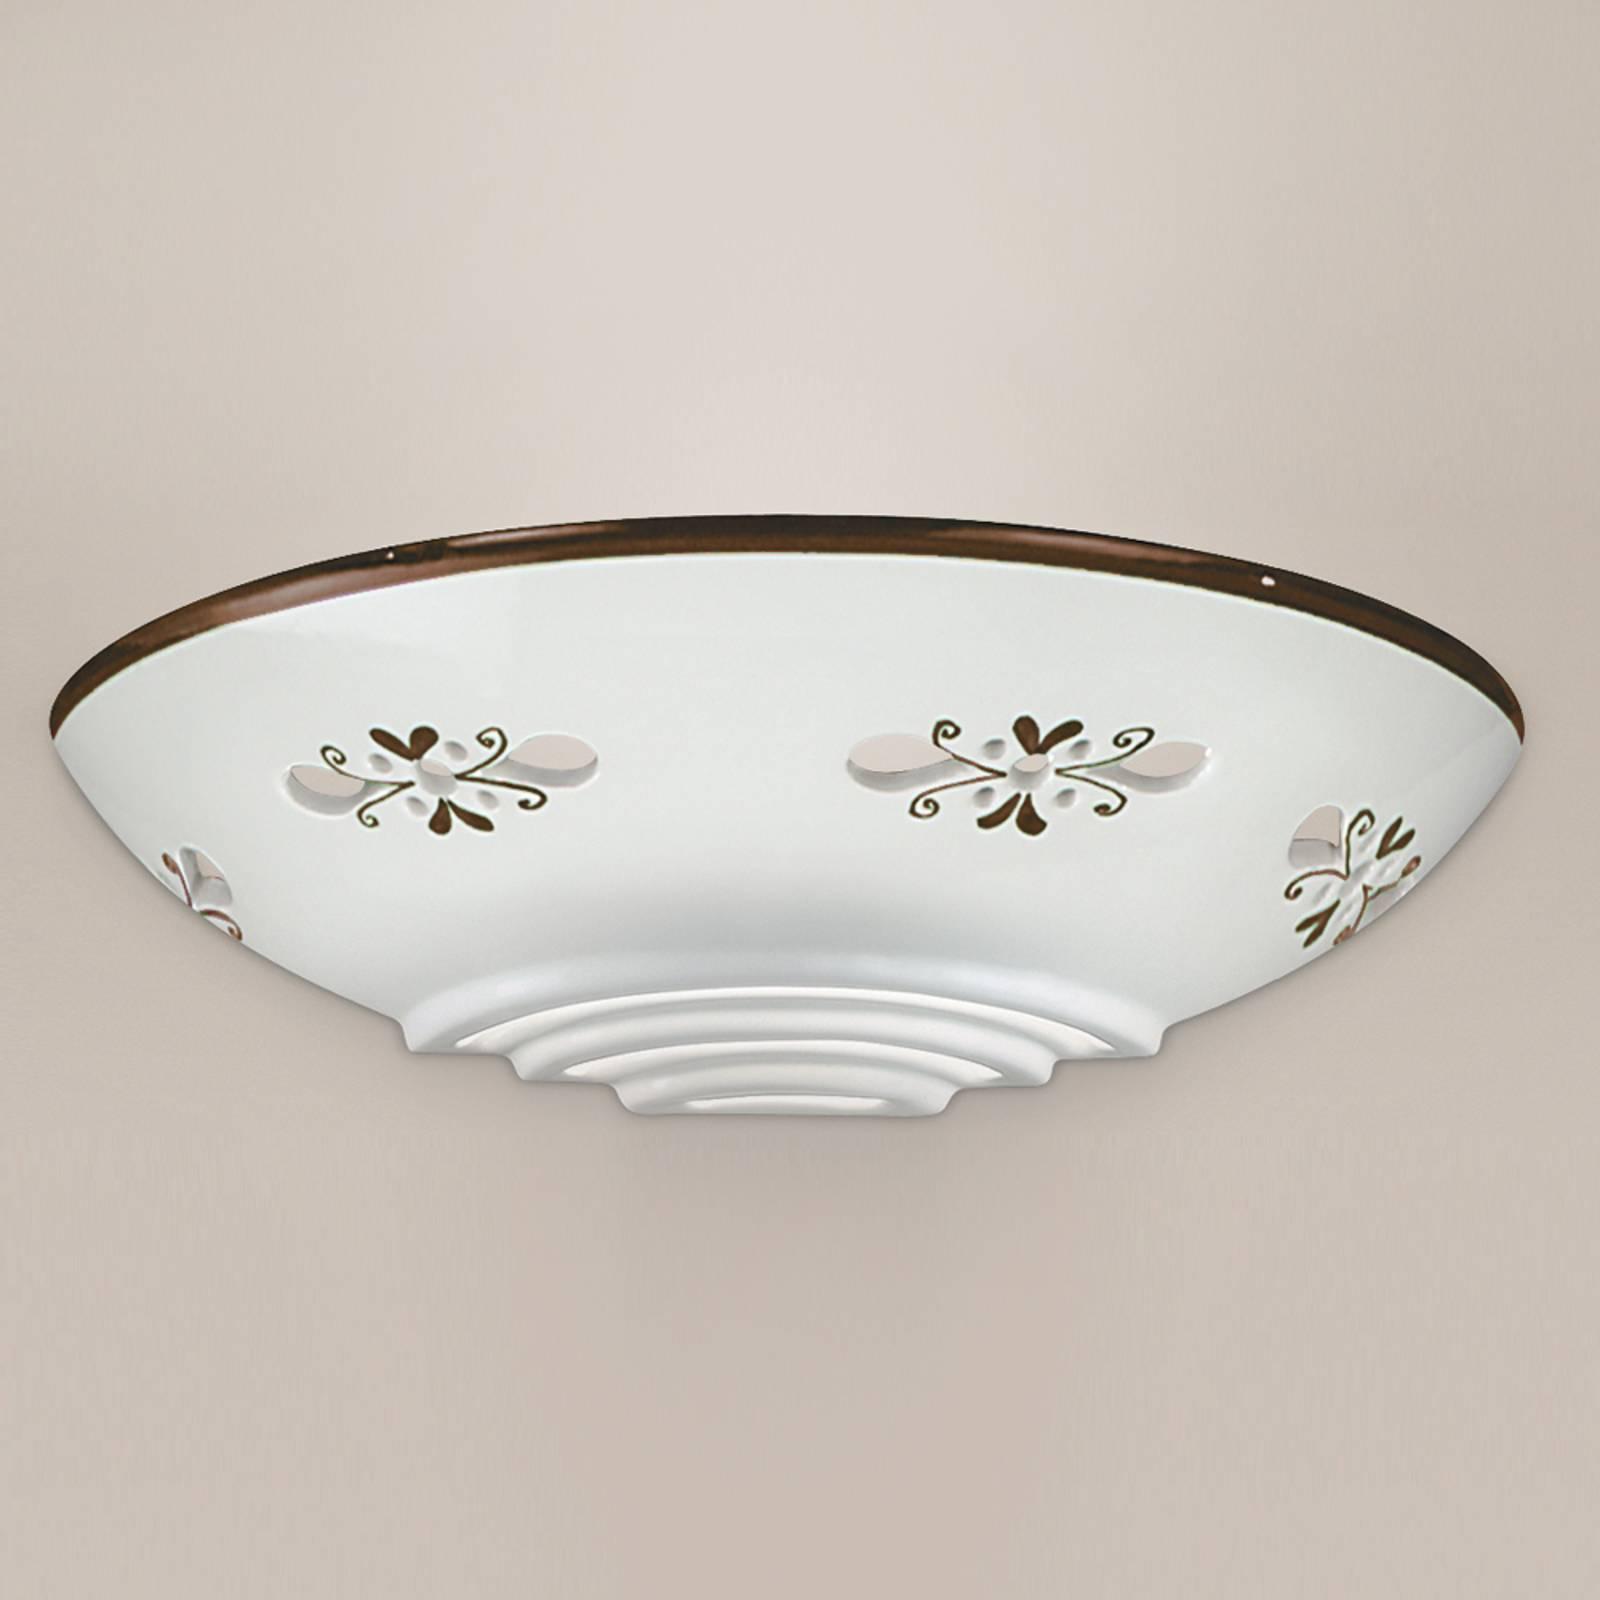 Bassano - mooie keramiek wandlamp, bruin